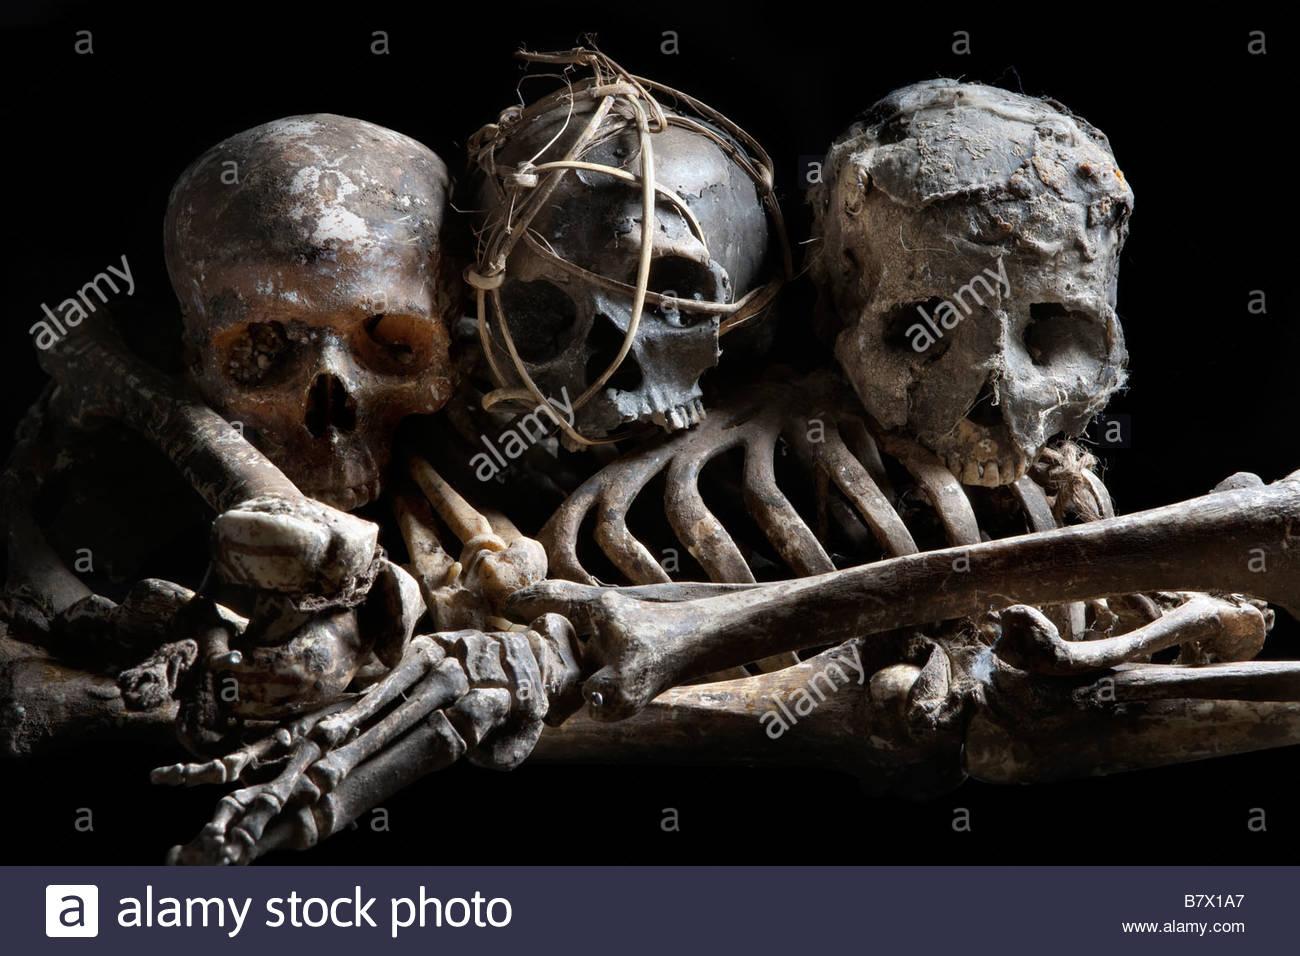 A Pile Of Skulls And Bones Stock Photos A Pile Of Skulls And Bones